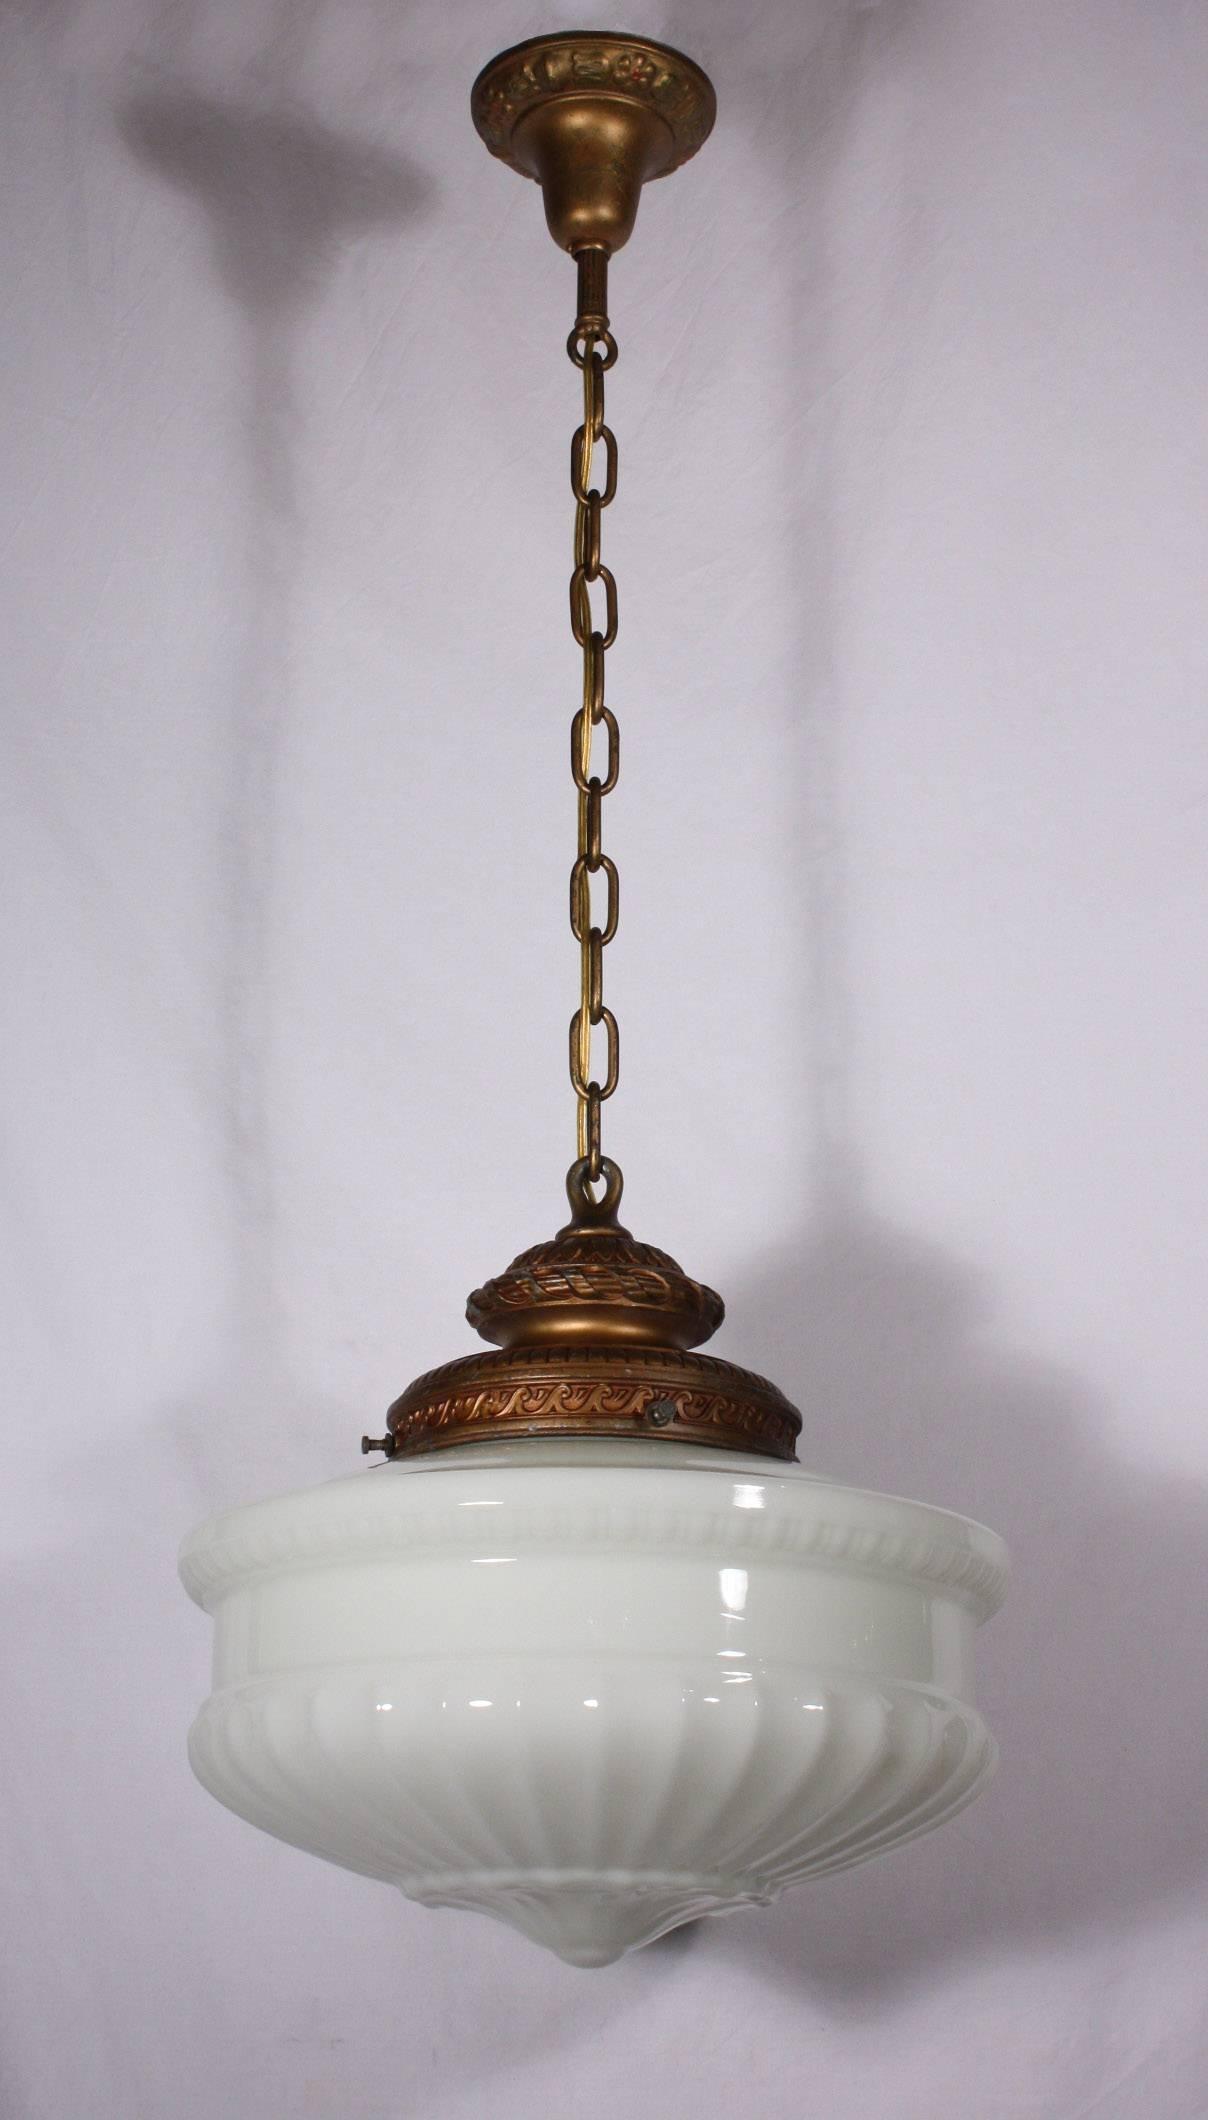 Elegant Milk Glass Pendant Light 41 On Rustic Mini Pendant Lights regarding Milk Glass Pendant Lights (Image 7 of 15)